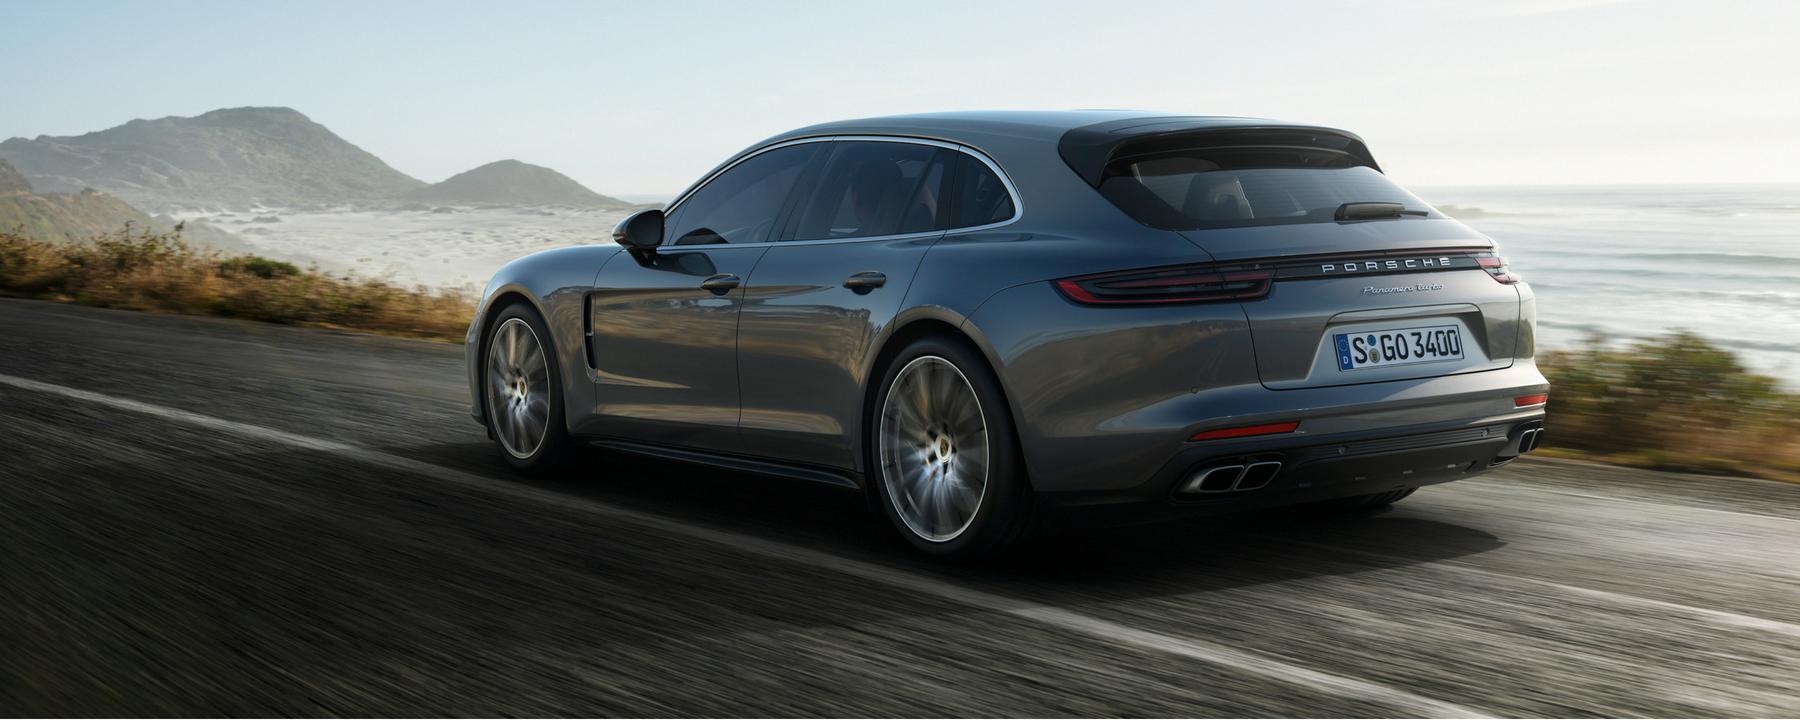 Porsche_Panamera_2018_1